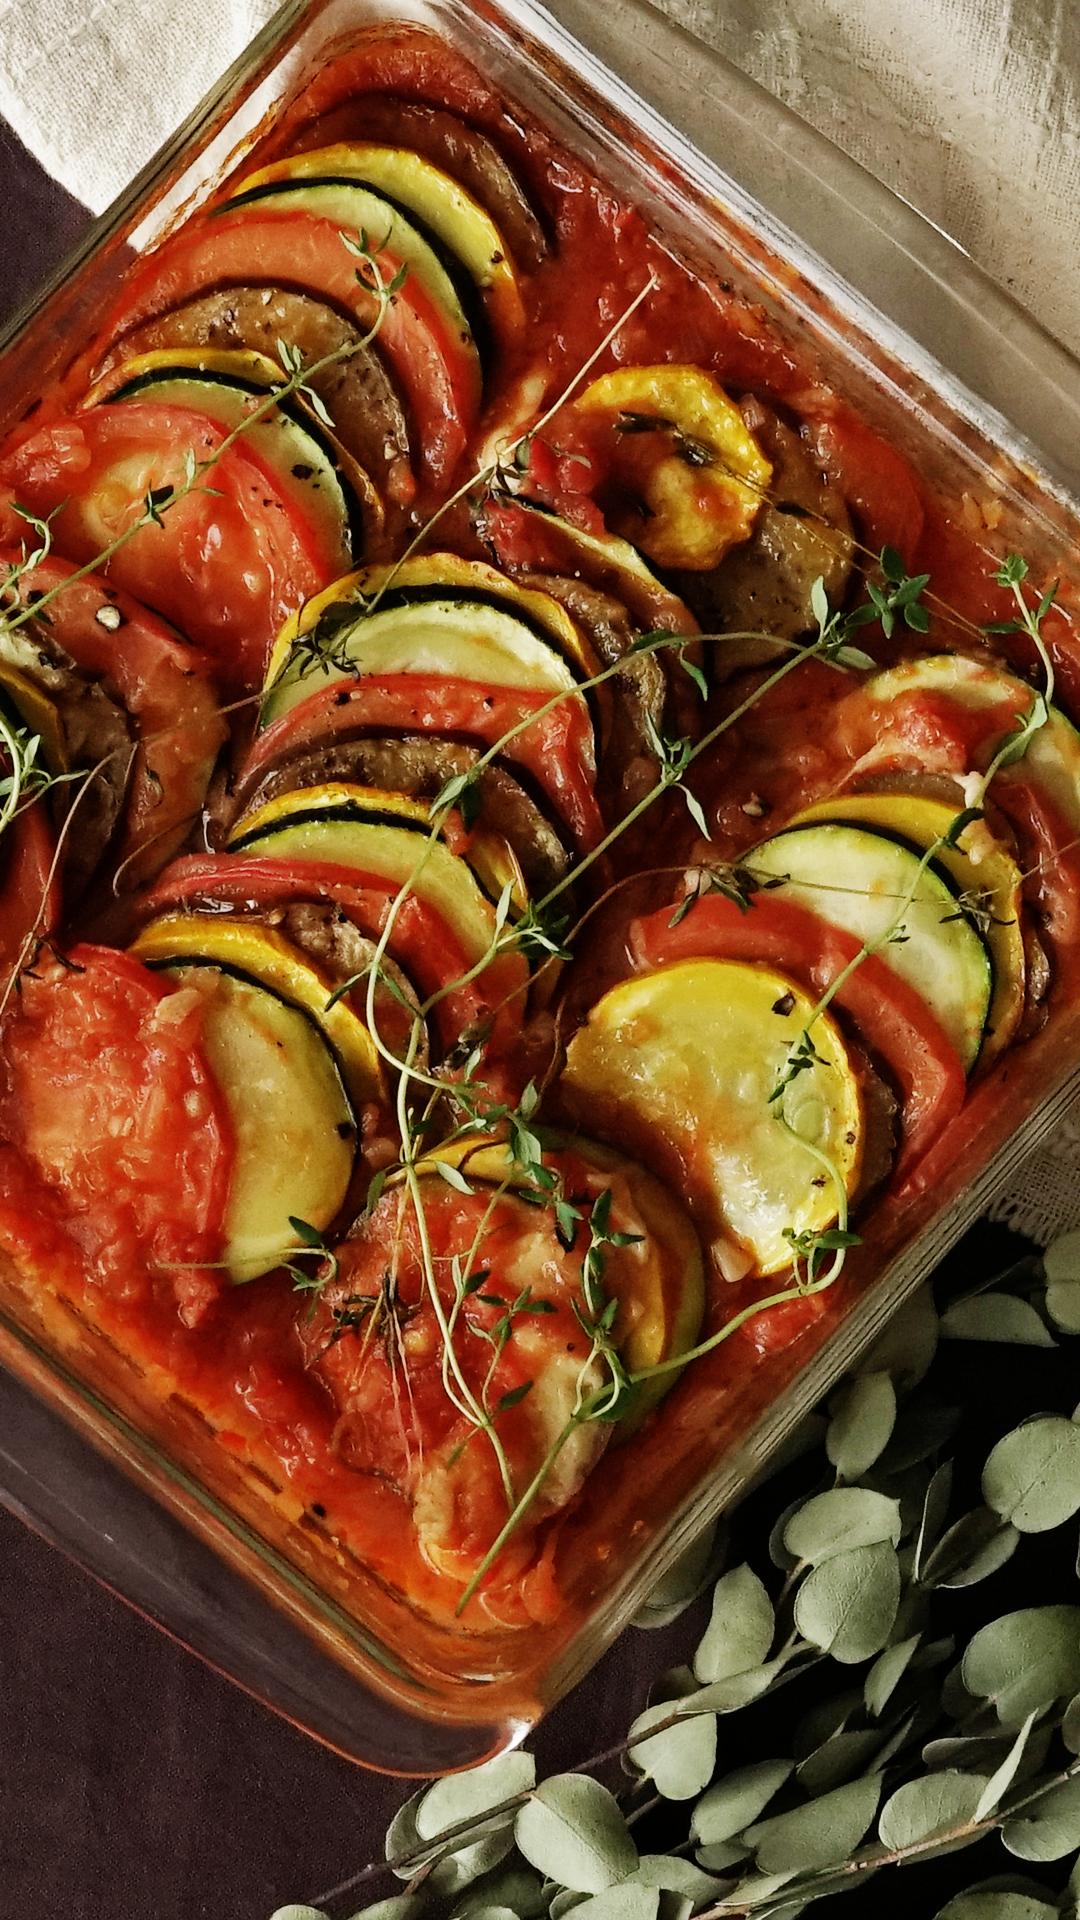 Summer Vegetables Ratatouille